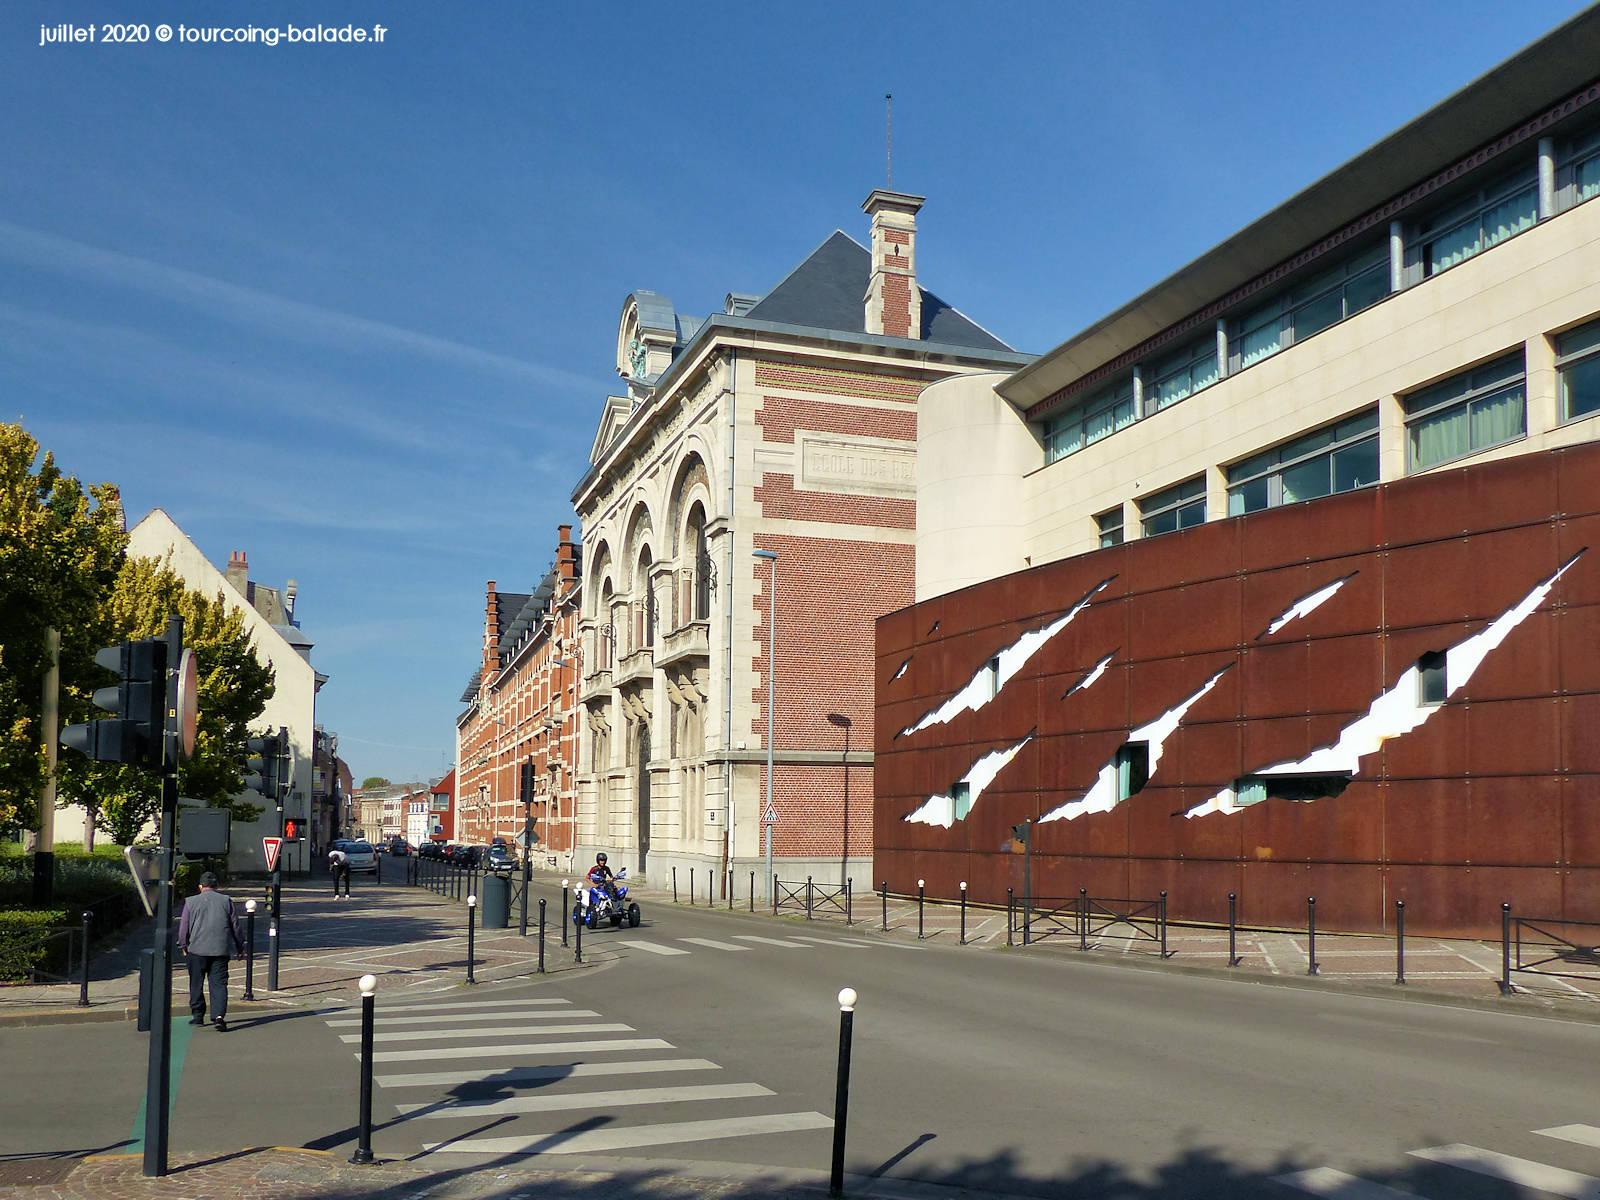 Rue de Gand, Tourcoing 2020